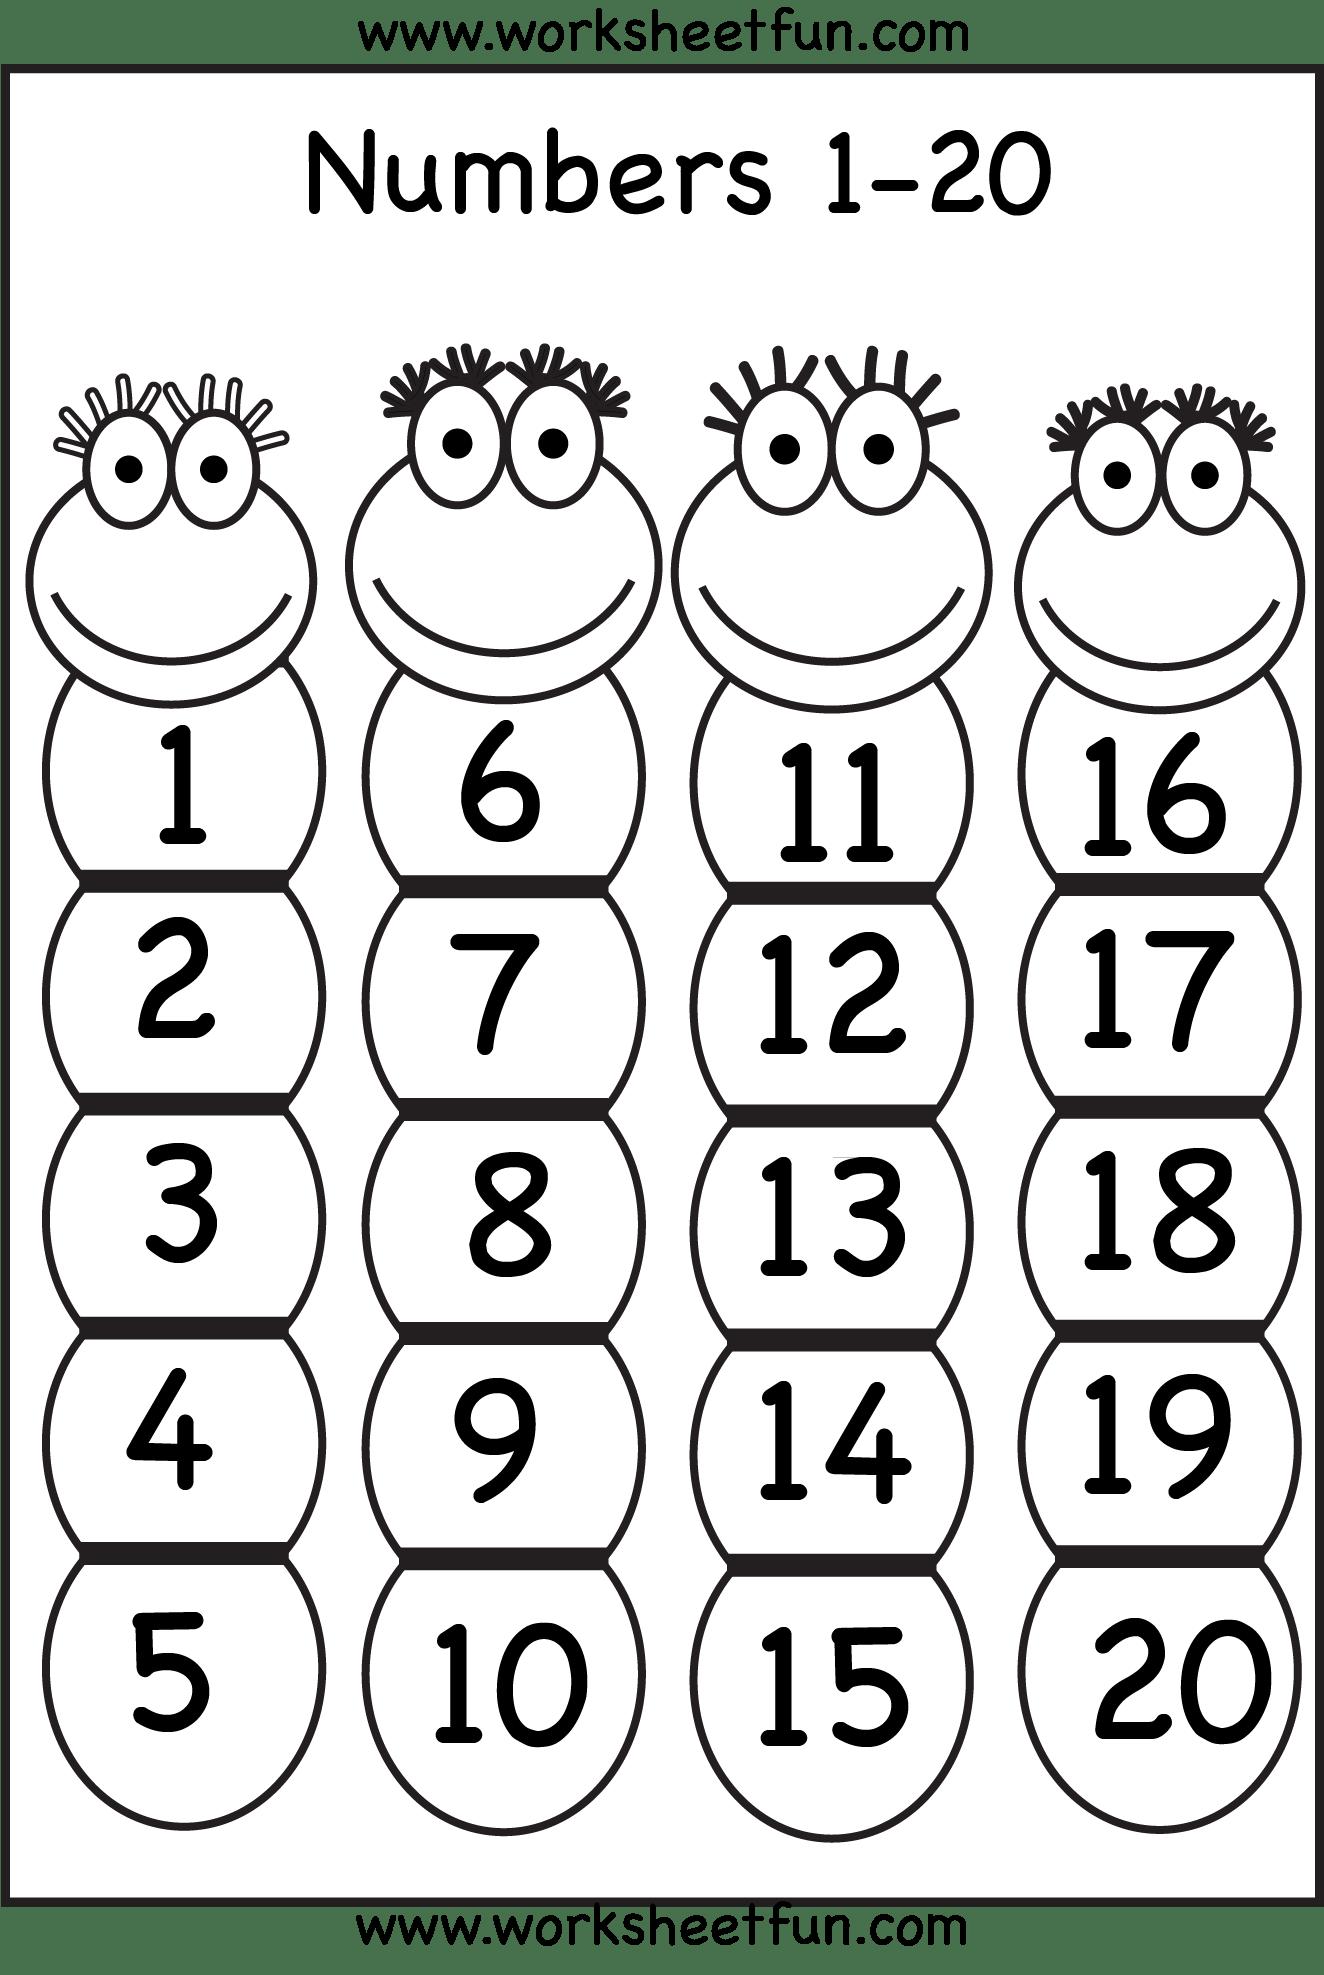 Number Chart 1 20 Free Printable Worksheets Worksheetfun